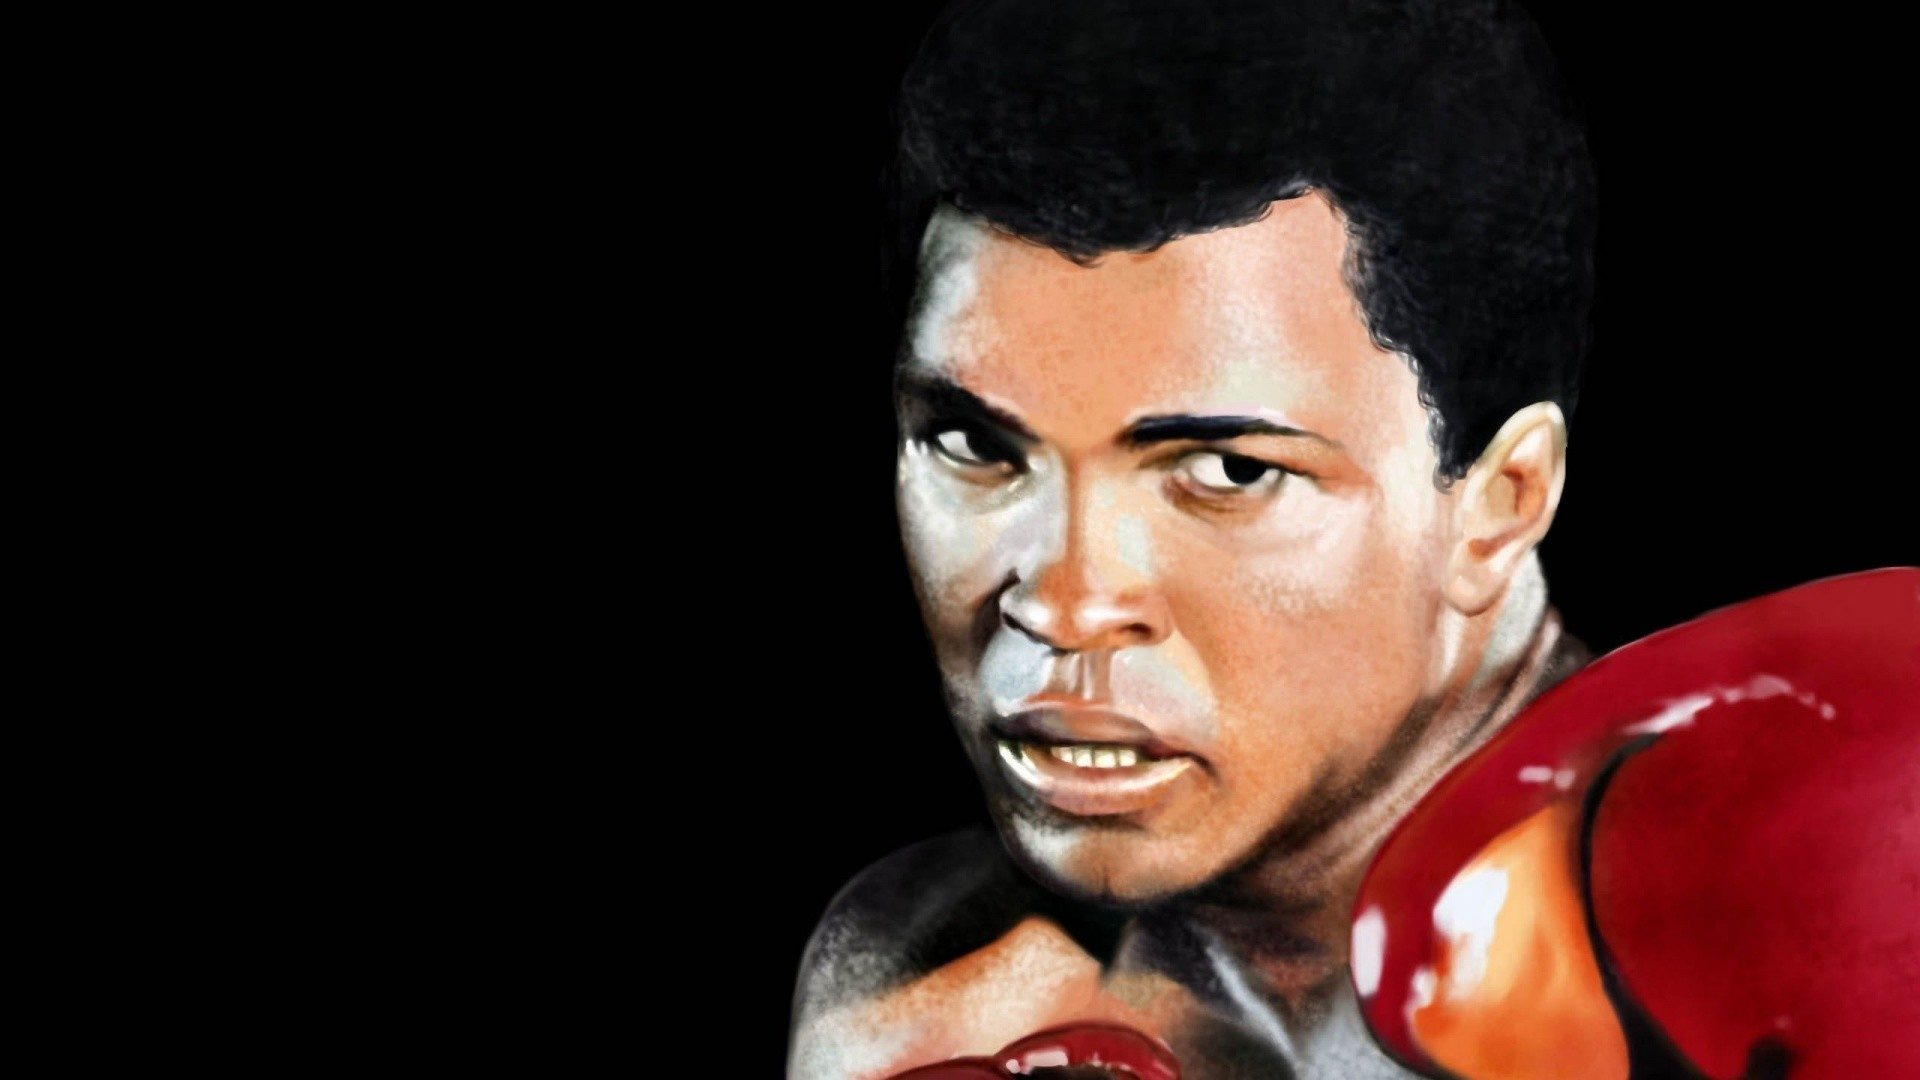 Muhammad Ali Wallpaper Free Download.